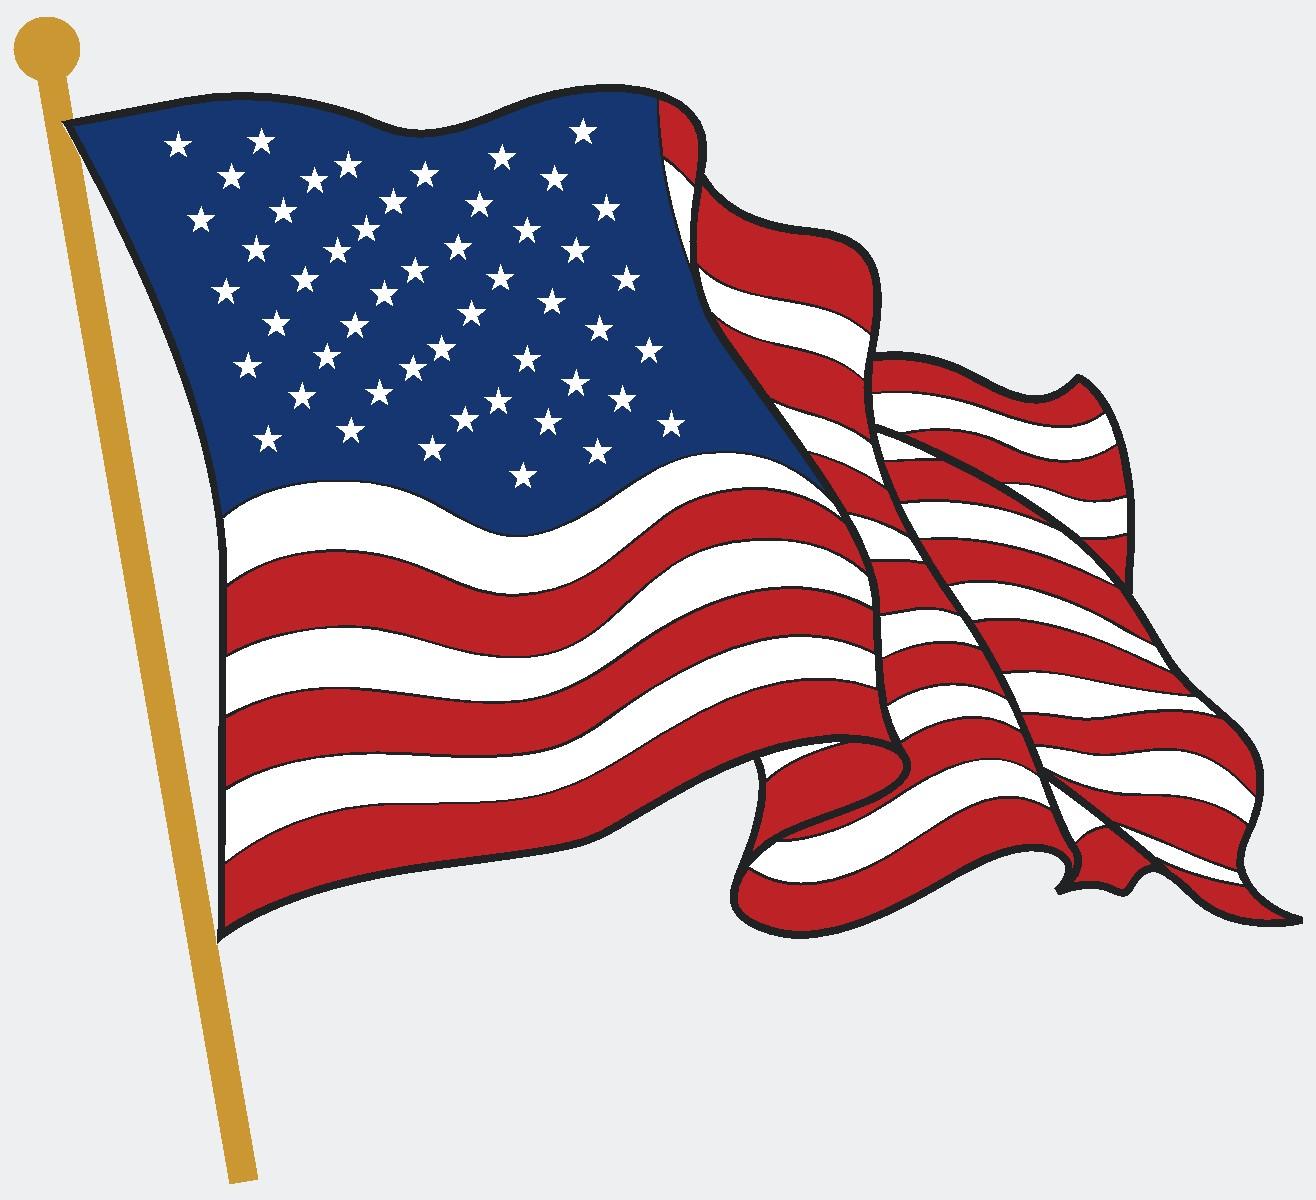 ... American flag free flag clip art clipart cliparting 3 - Cliparting clipartall.com ...